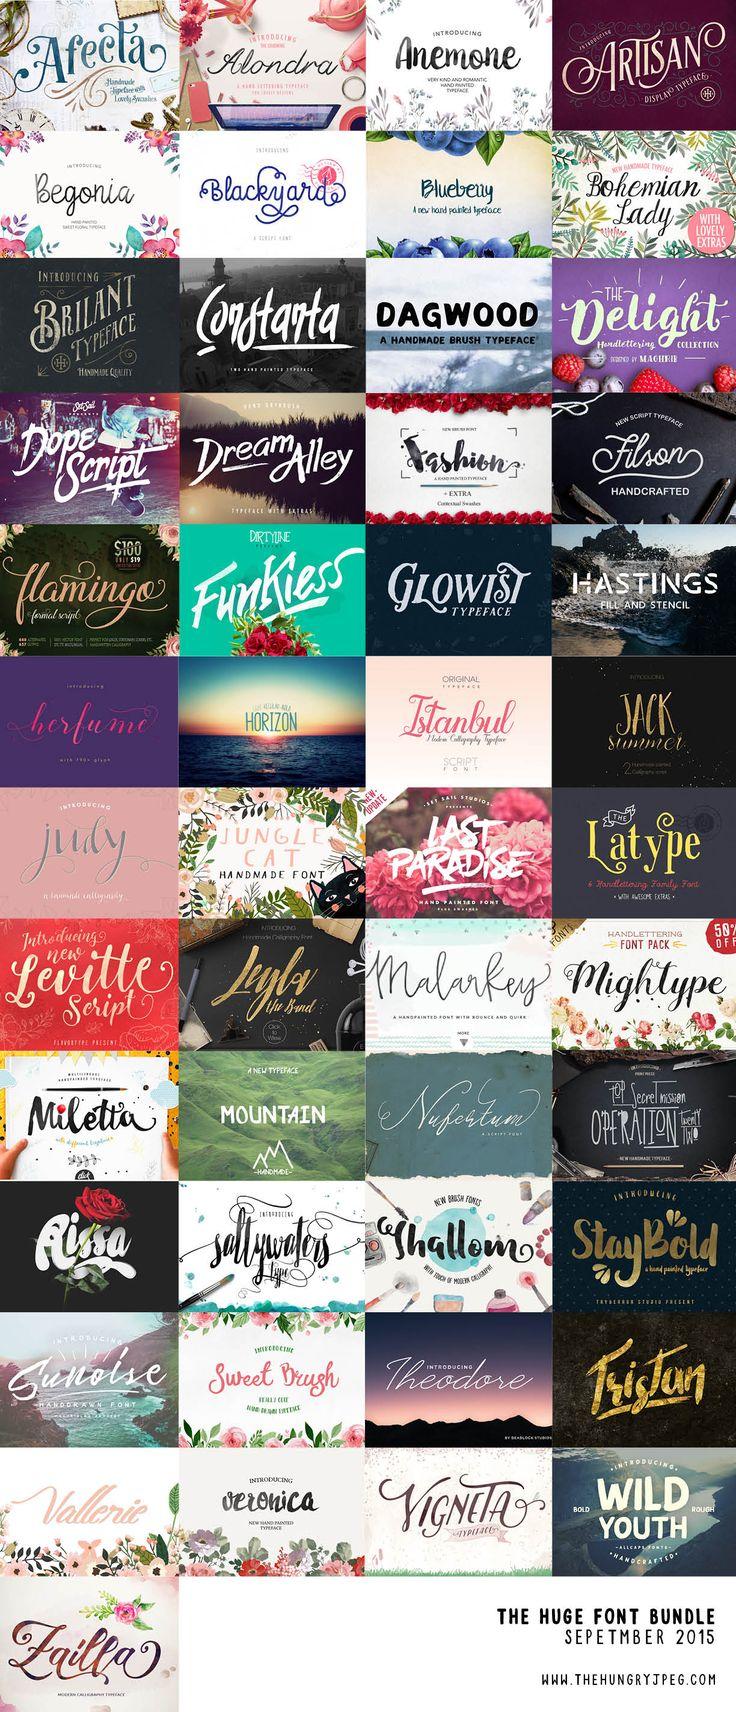 The Huge Font Bundle - September 2015 | The Hungry Jpeg